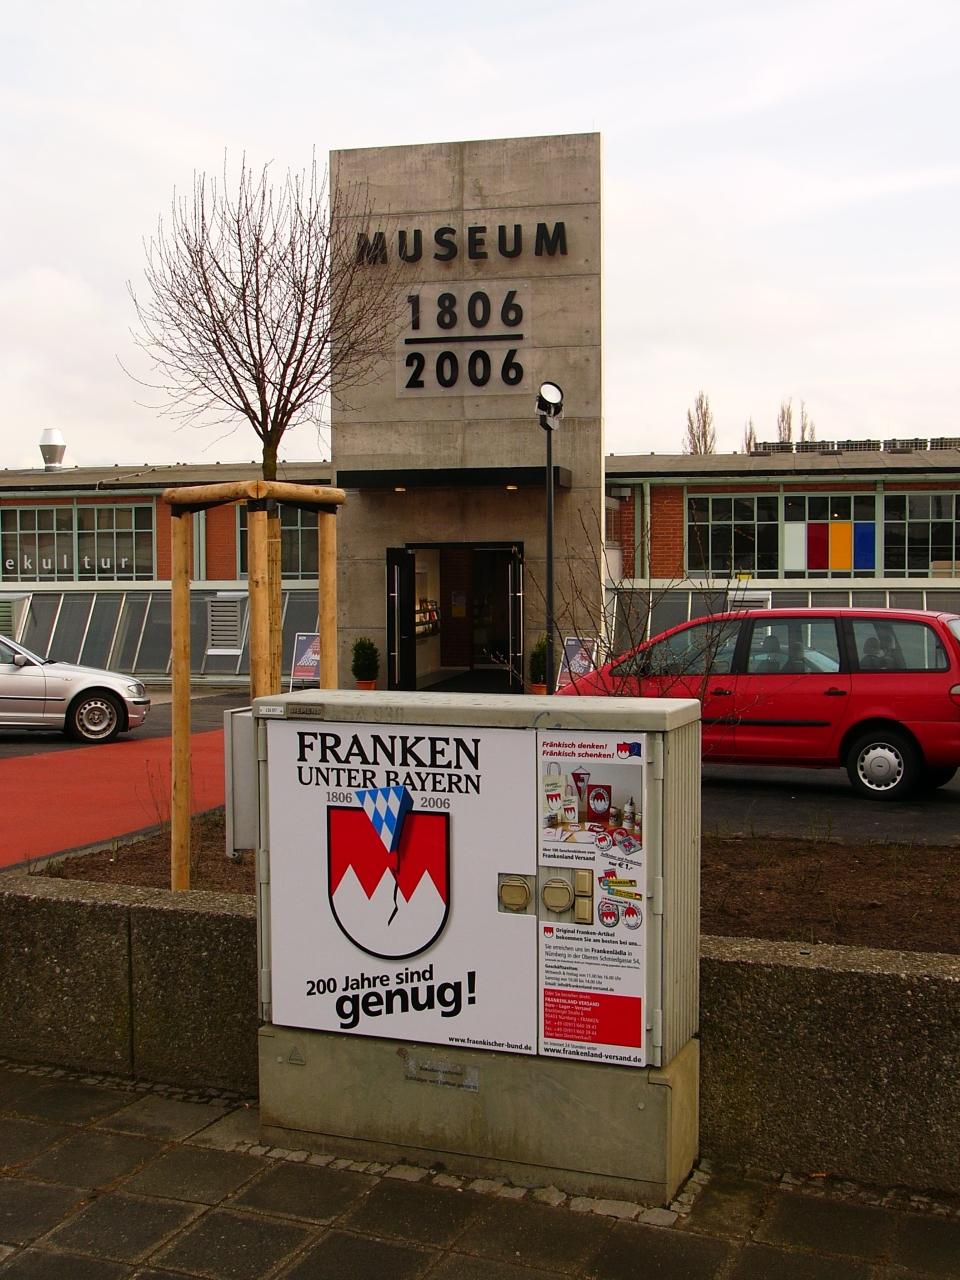 2006 FB schaukasten neben dem Eingang des Industrie museums in Nbg Frankenausstellungfoto J.Kalb.JPG